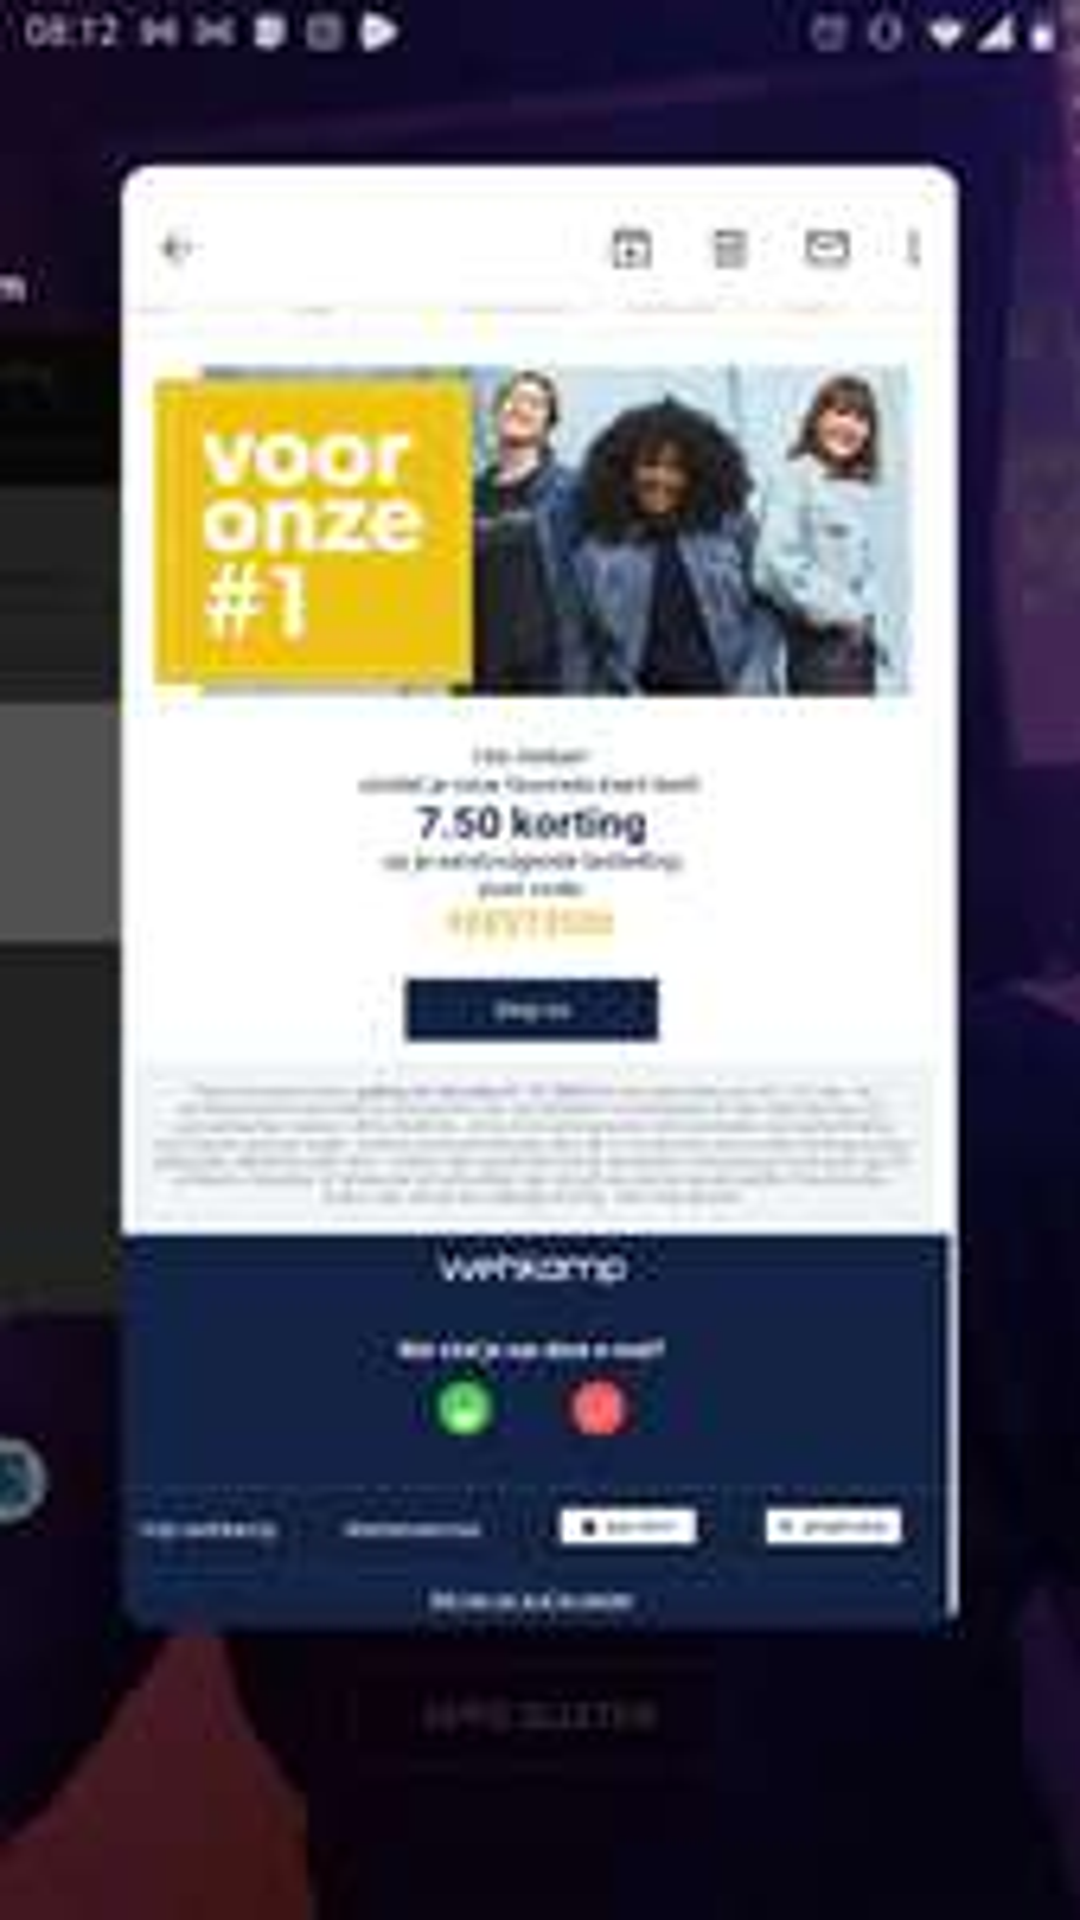 Wehkamp 7,50 korting vanaf €40